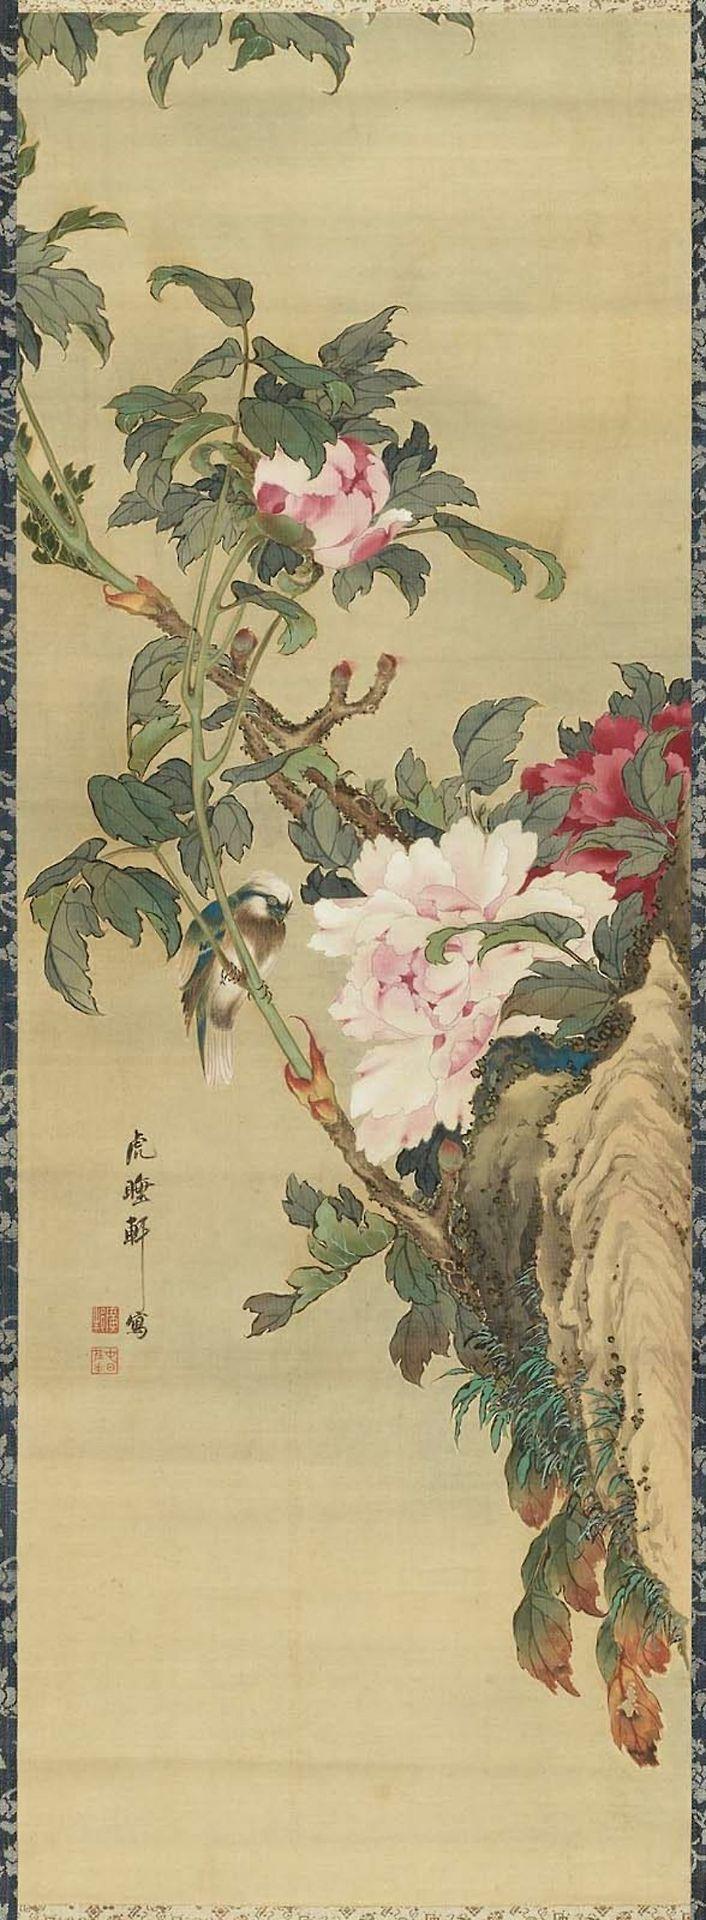 Peony And Bird 牡丹小禽図 Nagasaki, Edo period Kosuiken, via